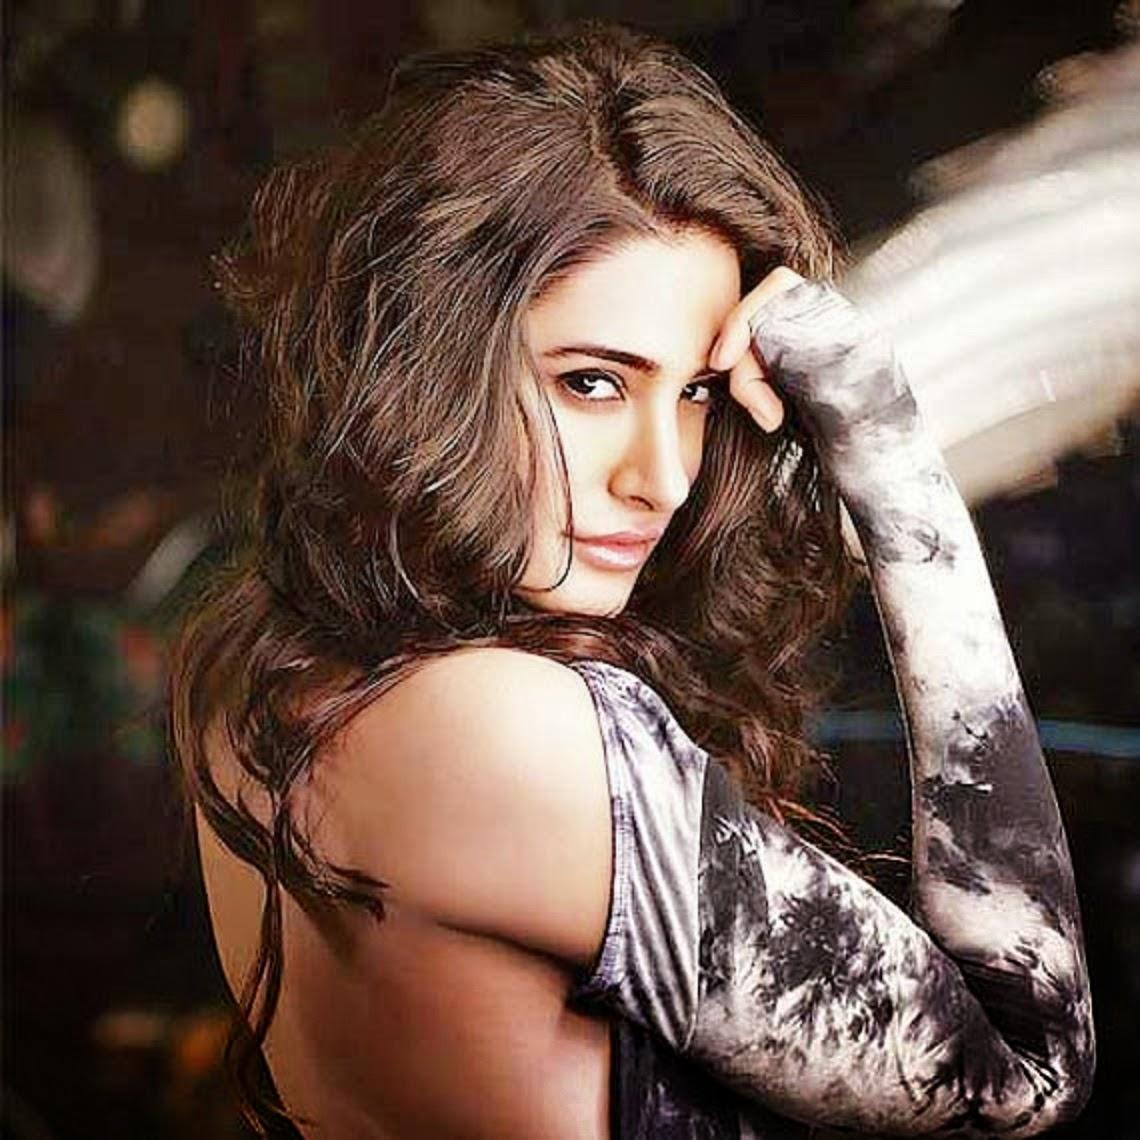 nargis fakhri exclusive hd wallpapers photoshoot hd pics